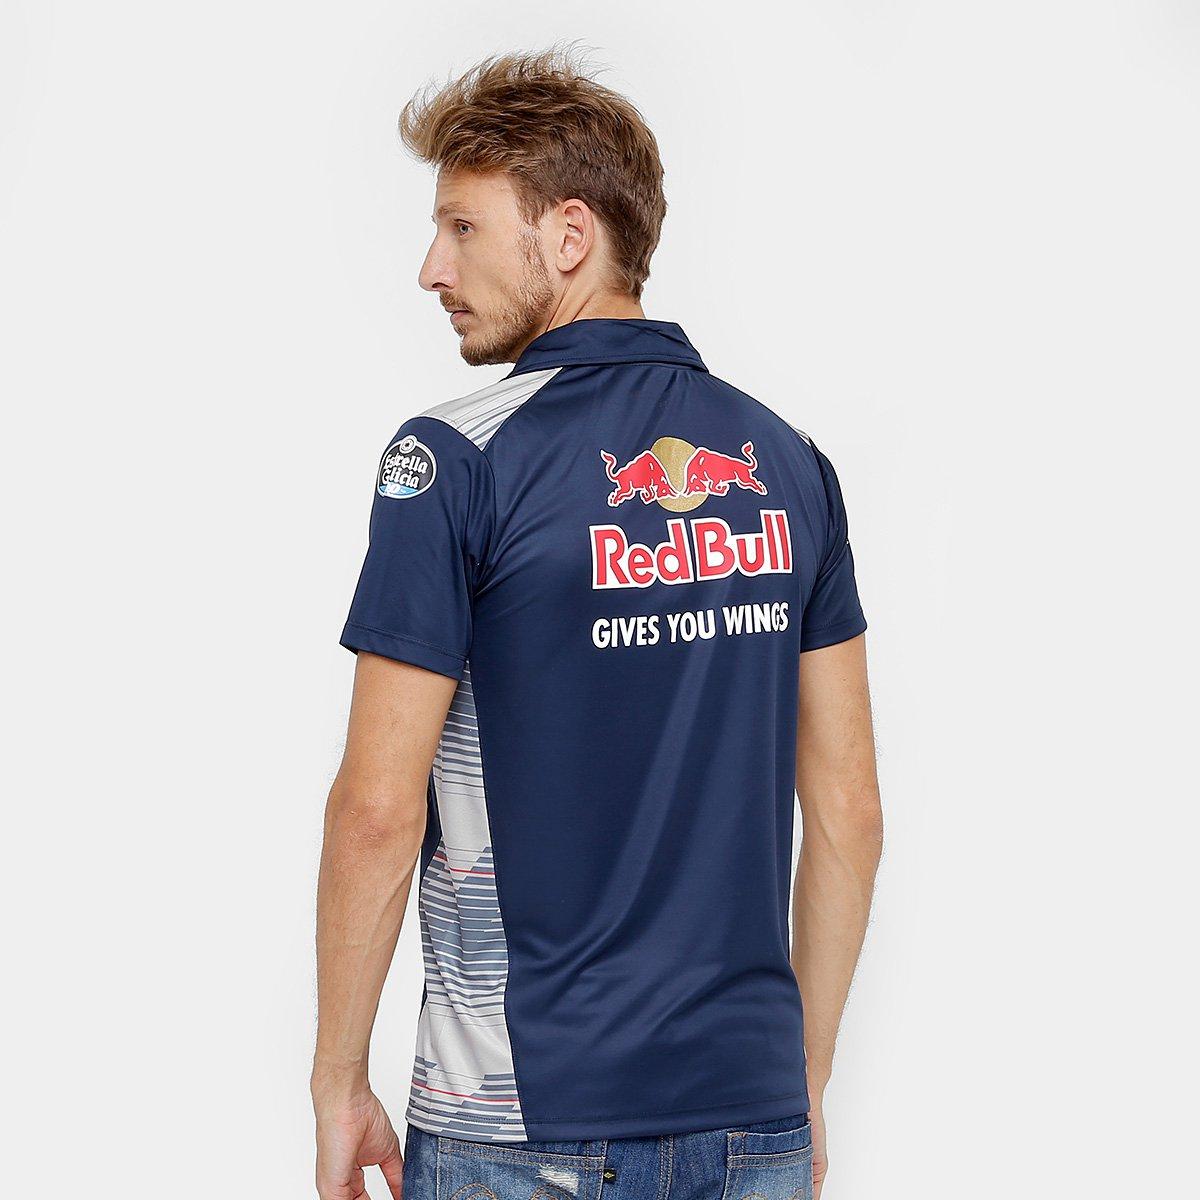 Camisa Polo Red Bull Funcional Toro Rosso OTL Masculina - Compre ... a71b3e18edc